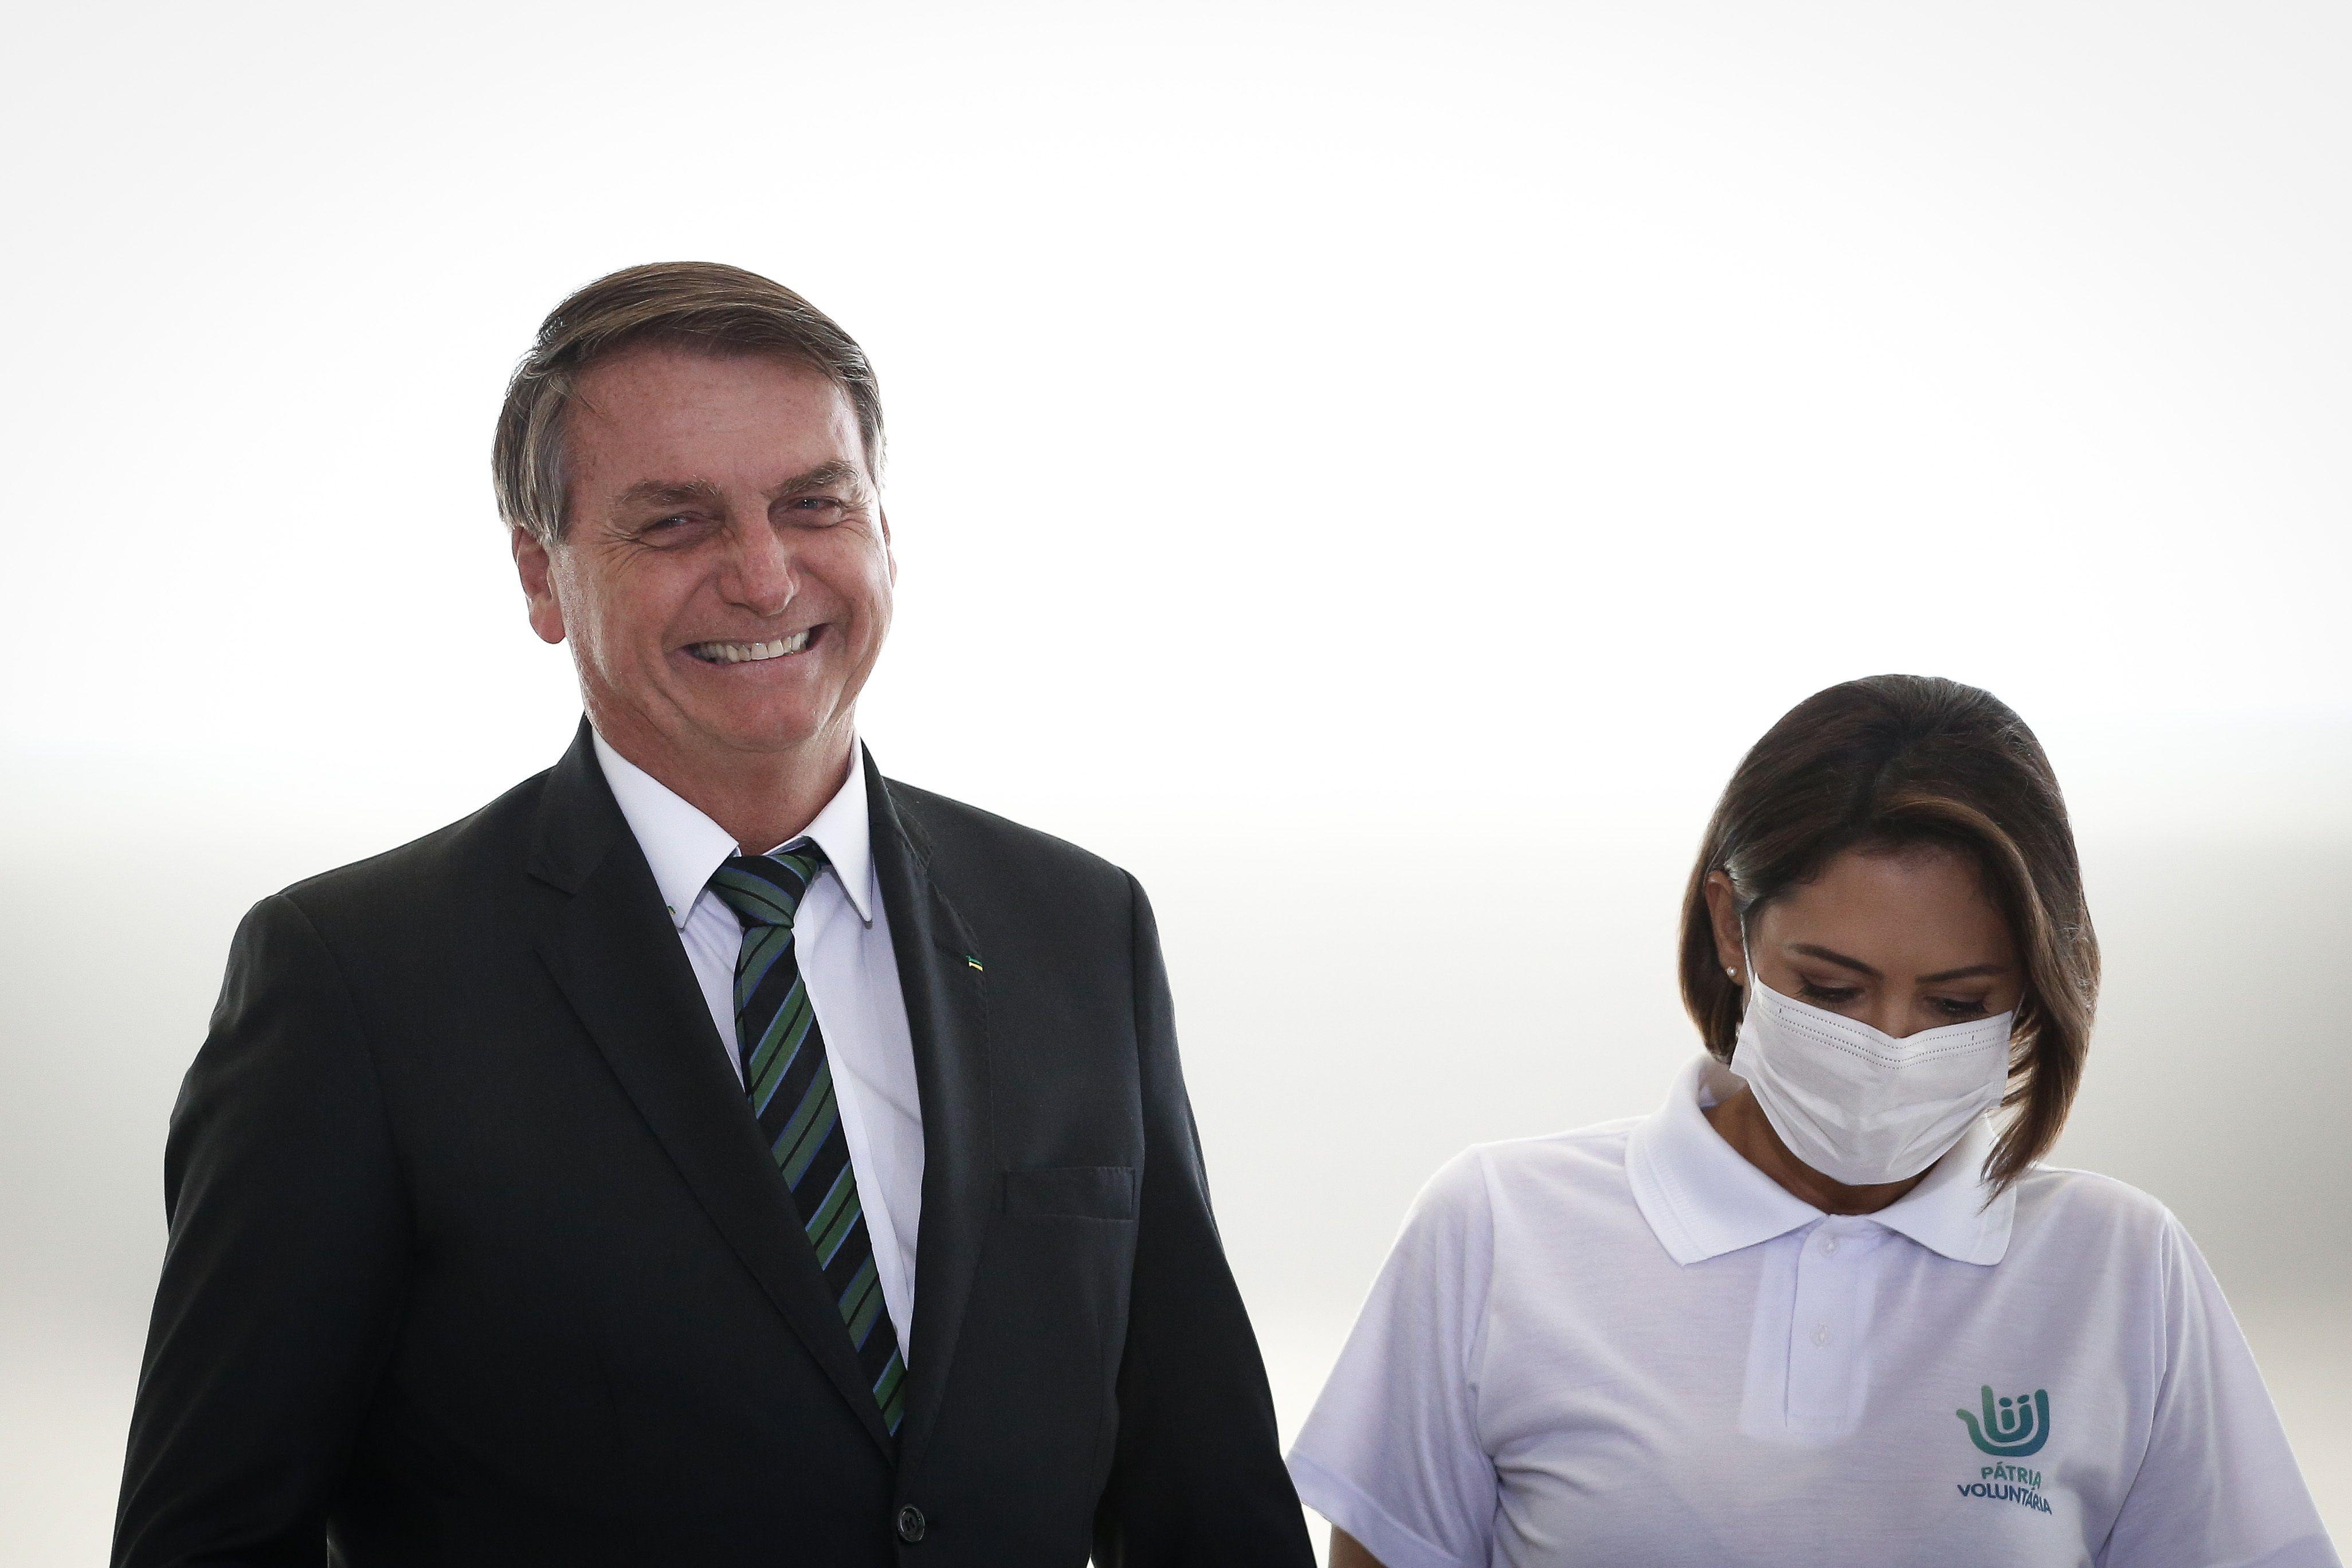 16/02/2021 El presidente de Brasil, Jair Bolsonaro, y la primeira dama, Michele Bolsonaro. POLITICA SUDAMÉRICA BRASIL INTERNACIONAL LATINOAMÉRICA O GLOBO / ZUMA PRESS / CONTACTOPHOTO